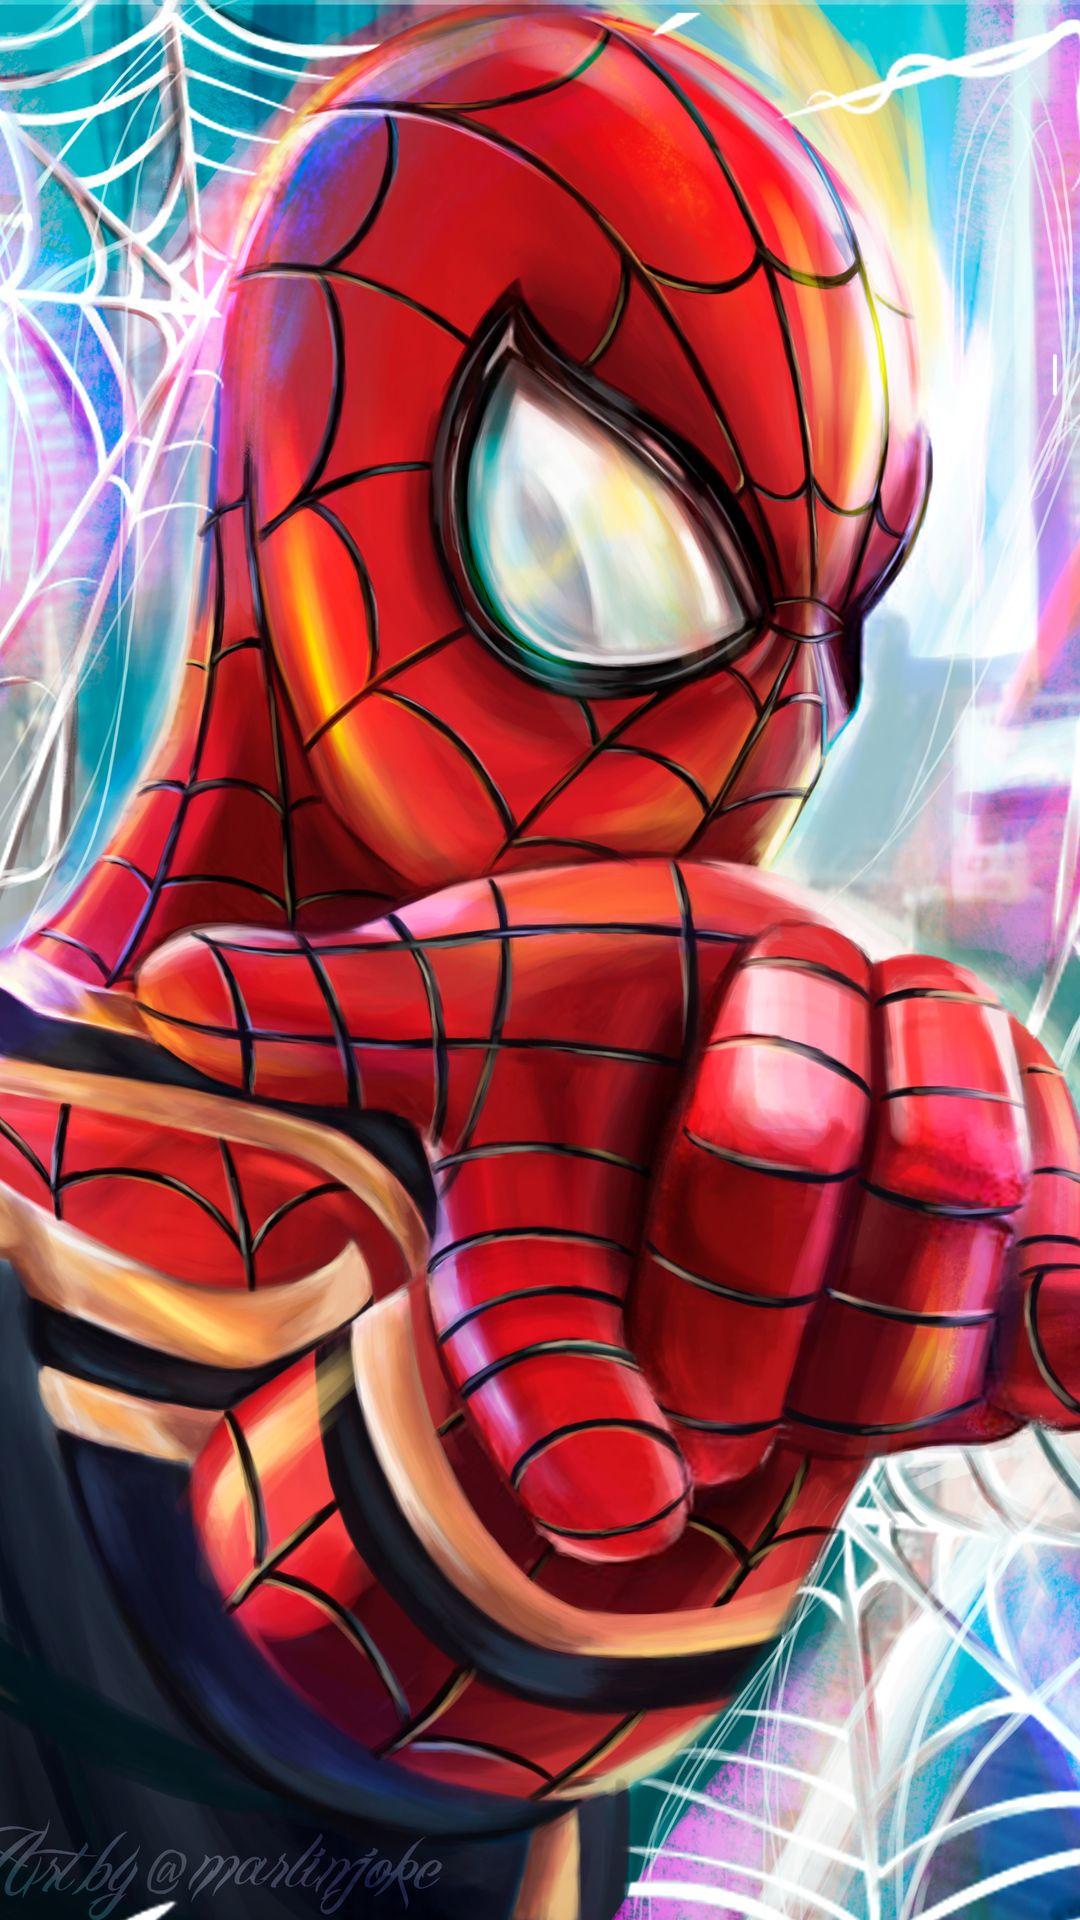 Spiderman 4k Paint Art Marvel Spiderman Art Spiderman Artwork Spiderman Drawing